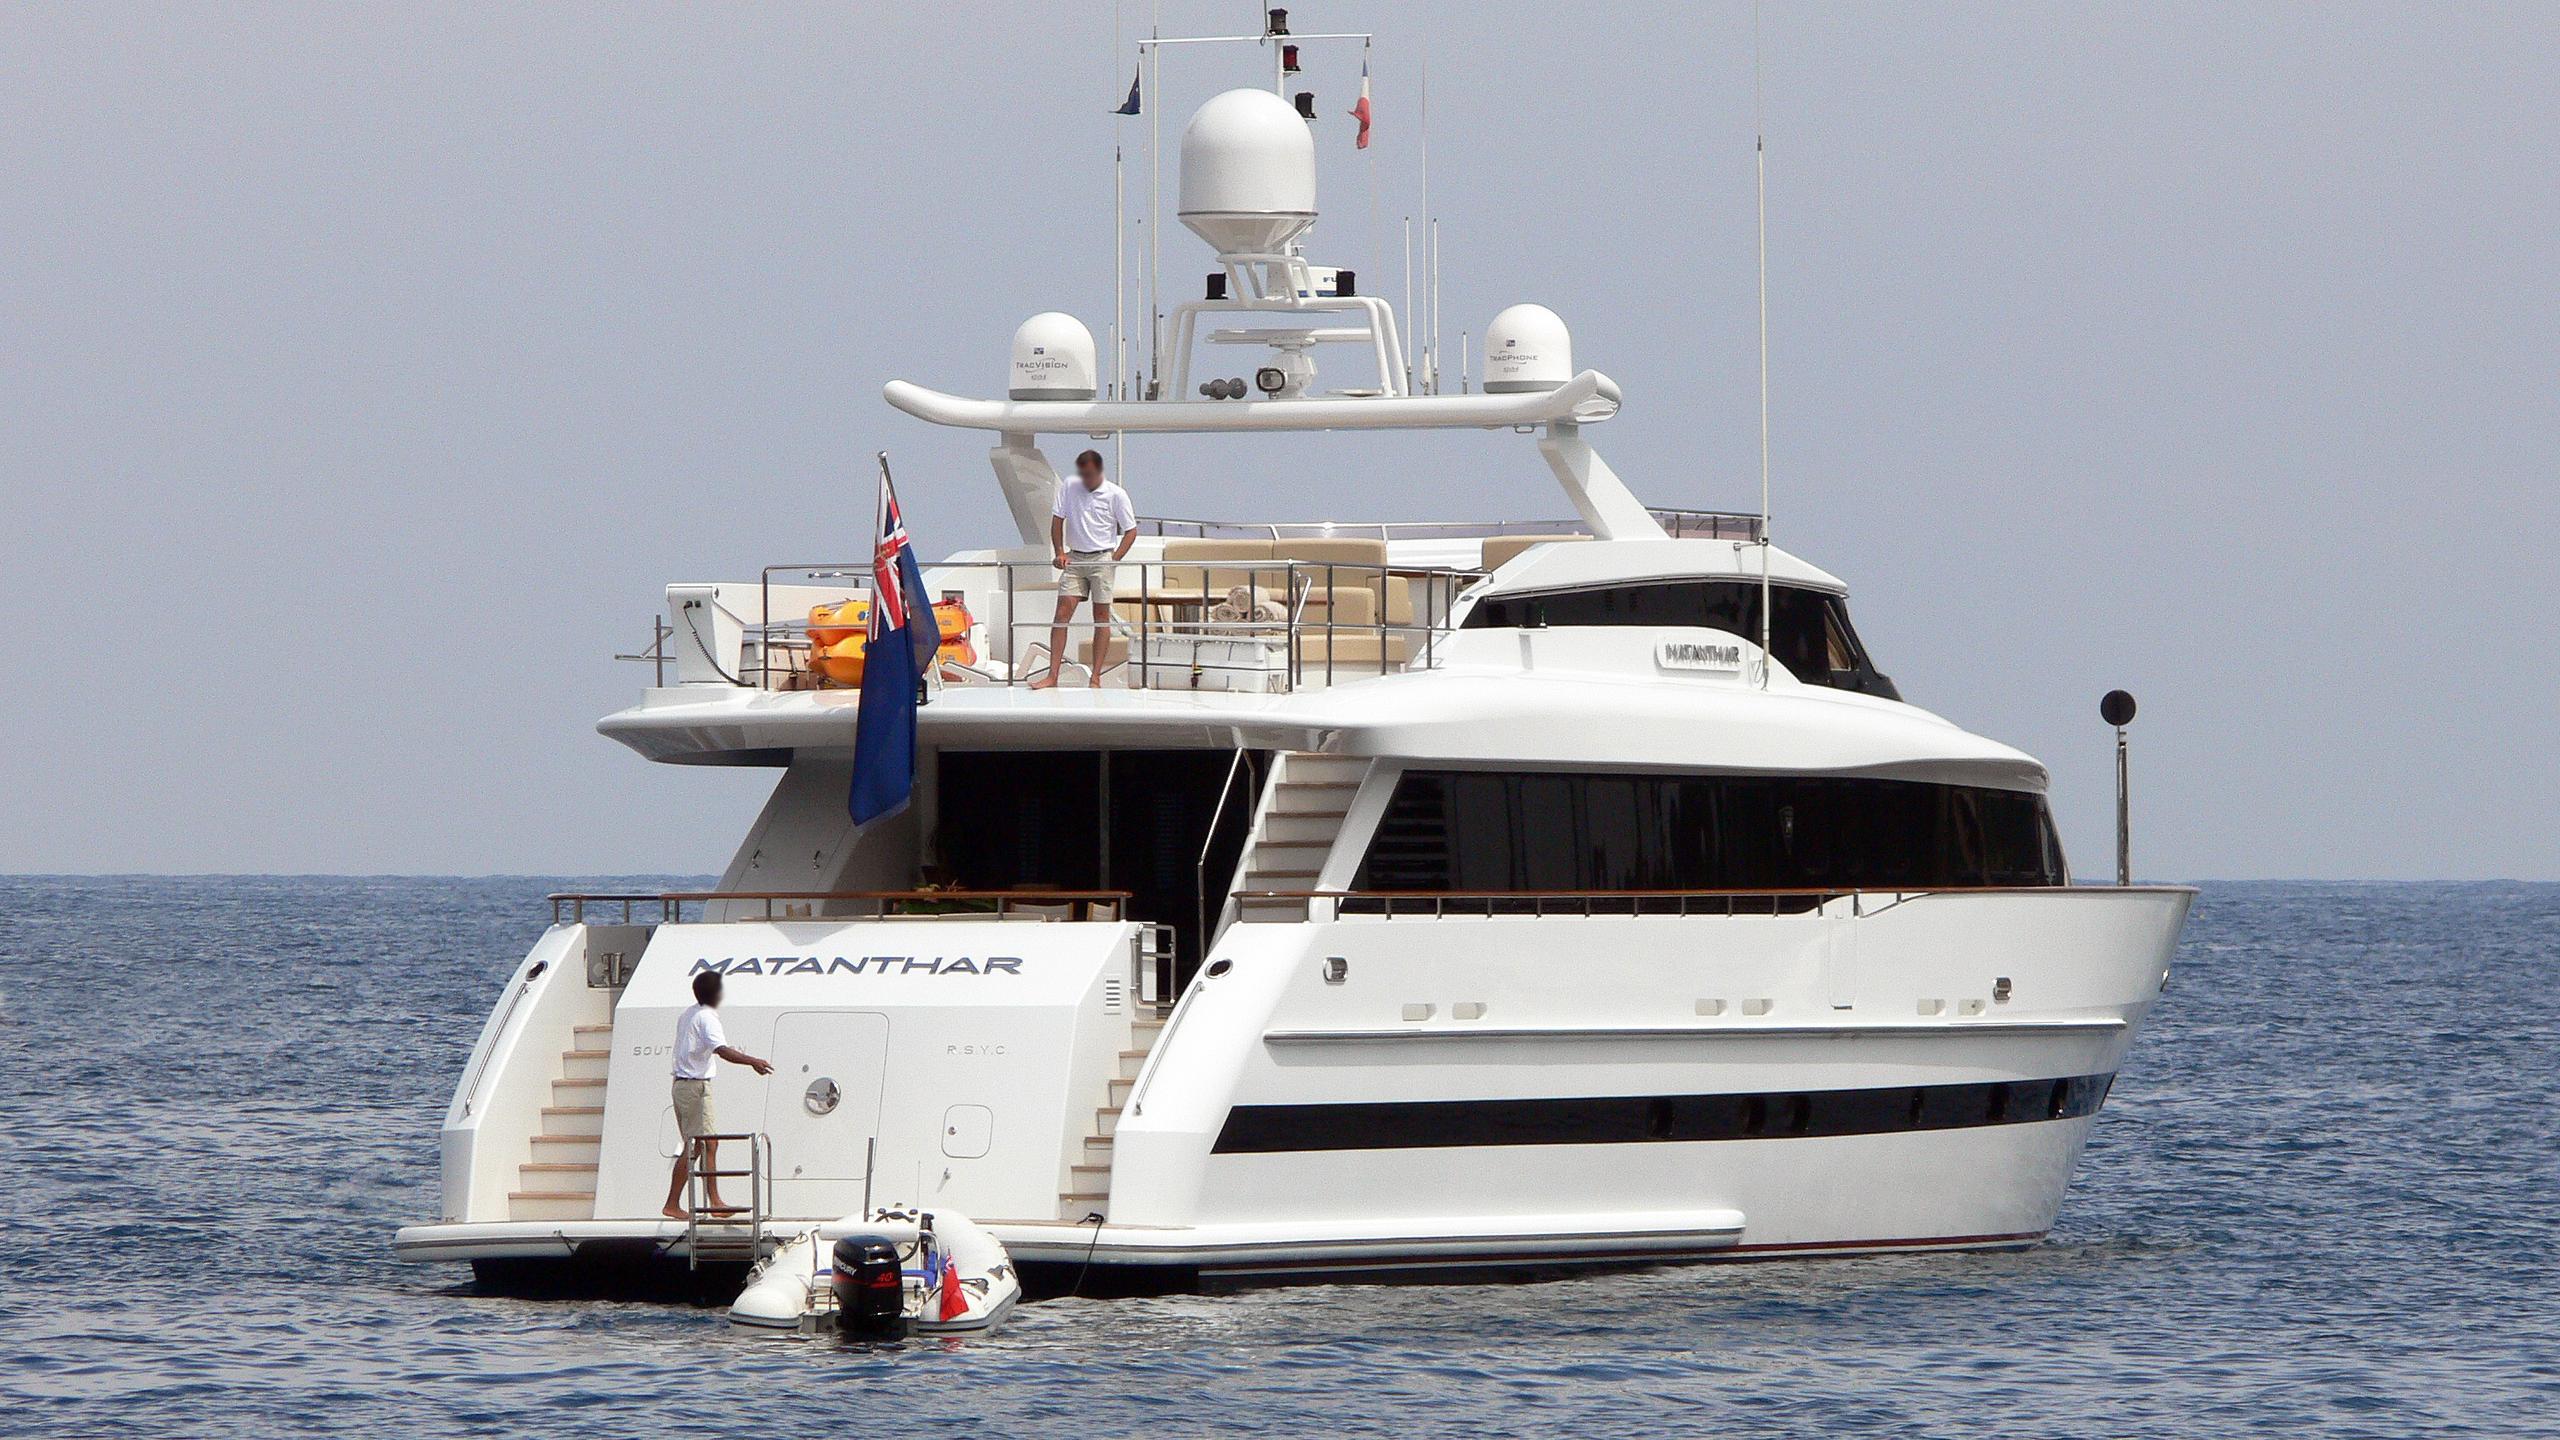 zabava-pokrov-ii-matanthar-motor-yacht-heesen-2000-31m-stern